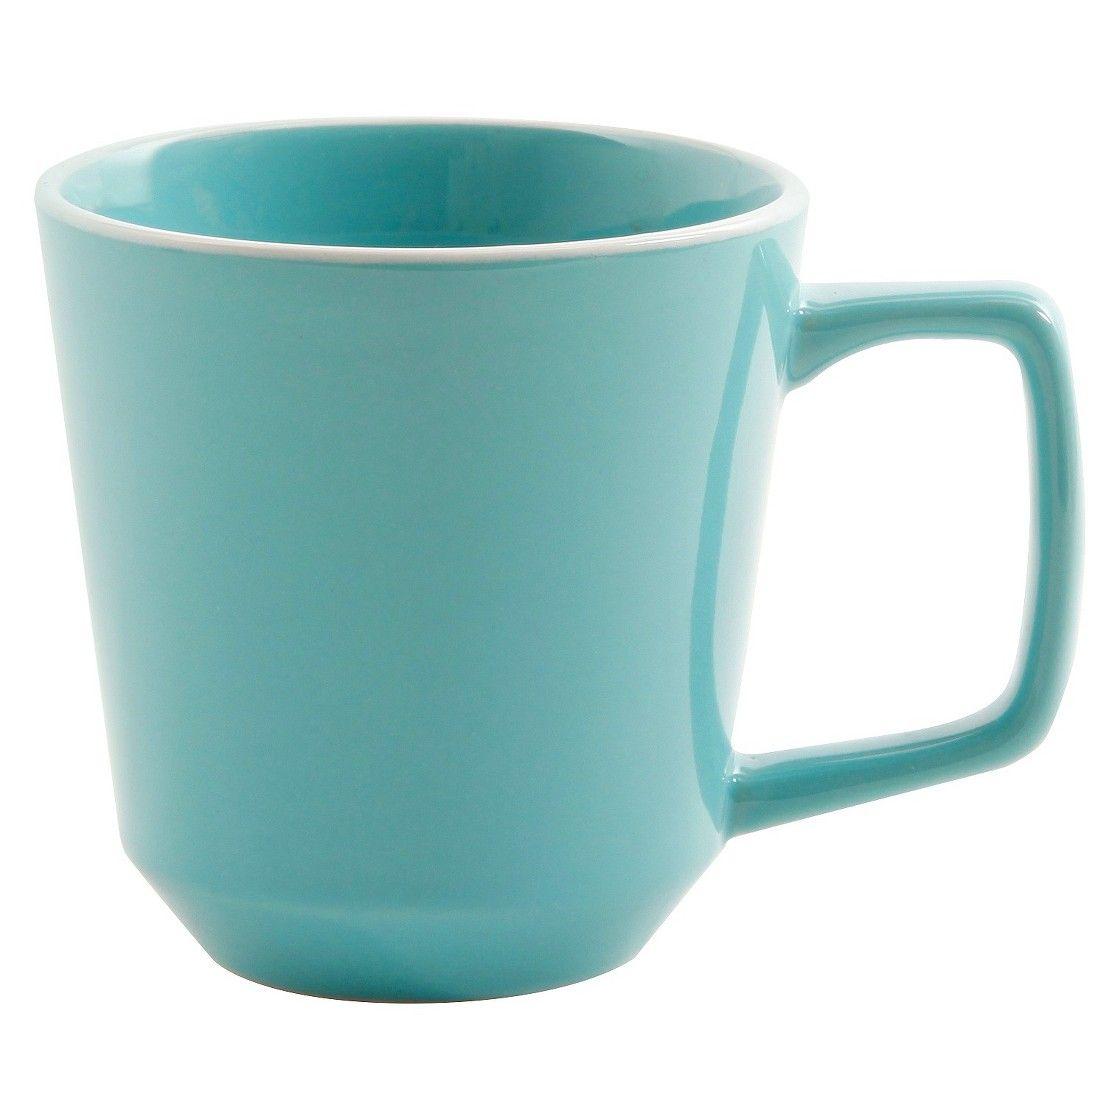 Room Essentials� Stoneware Coffee Mug - Turquoise